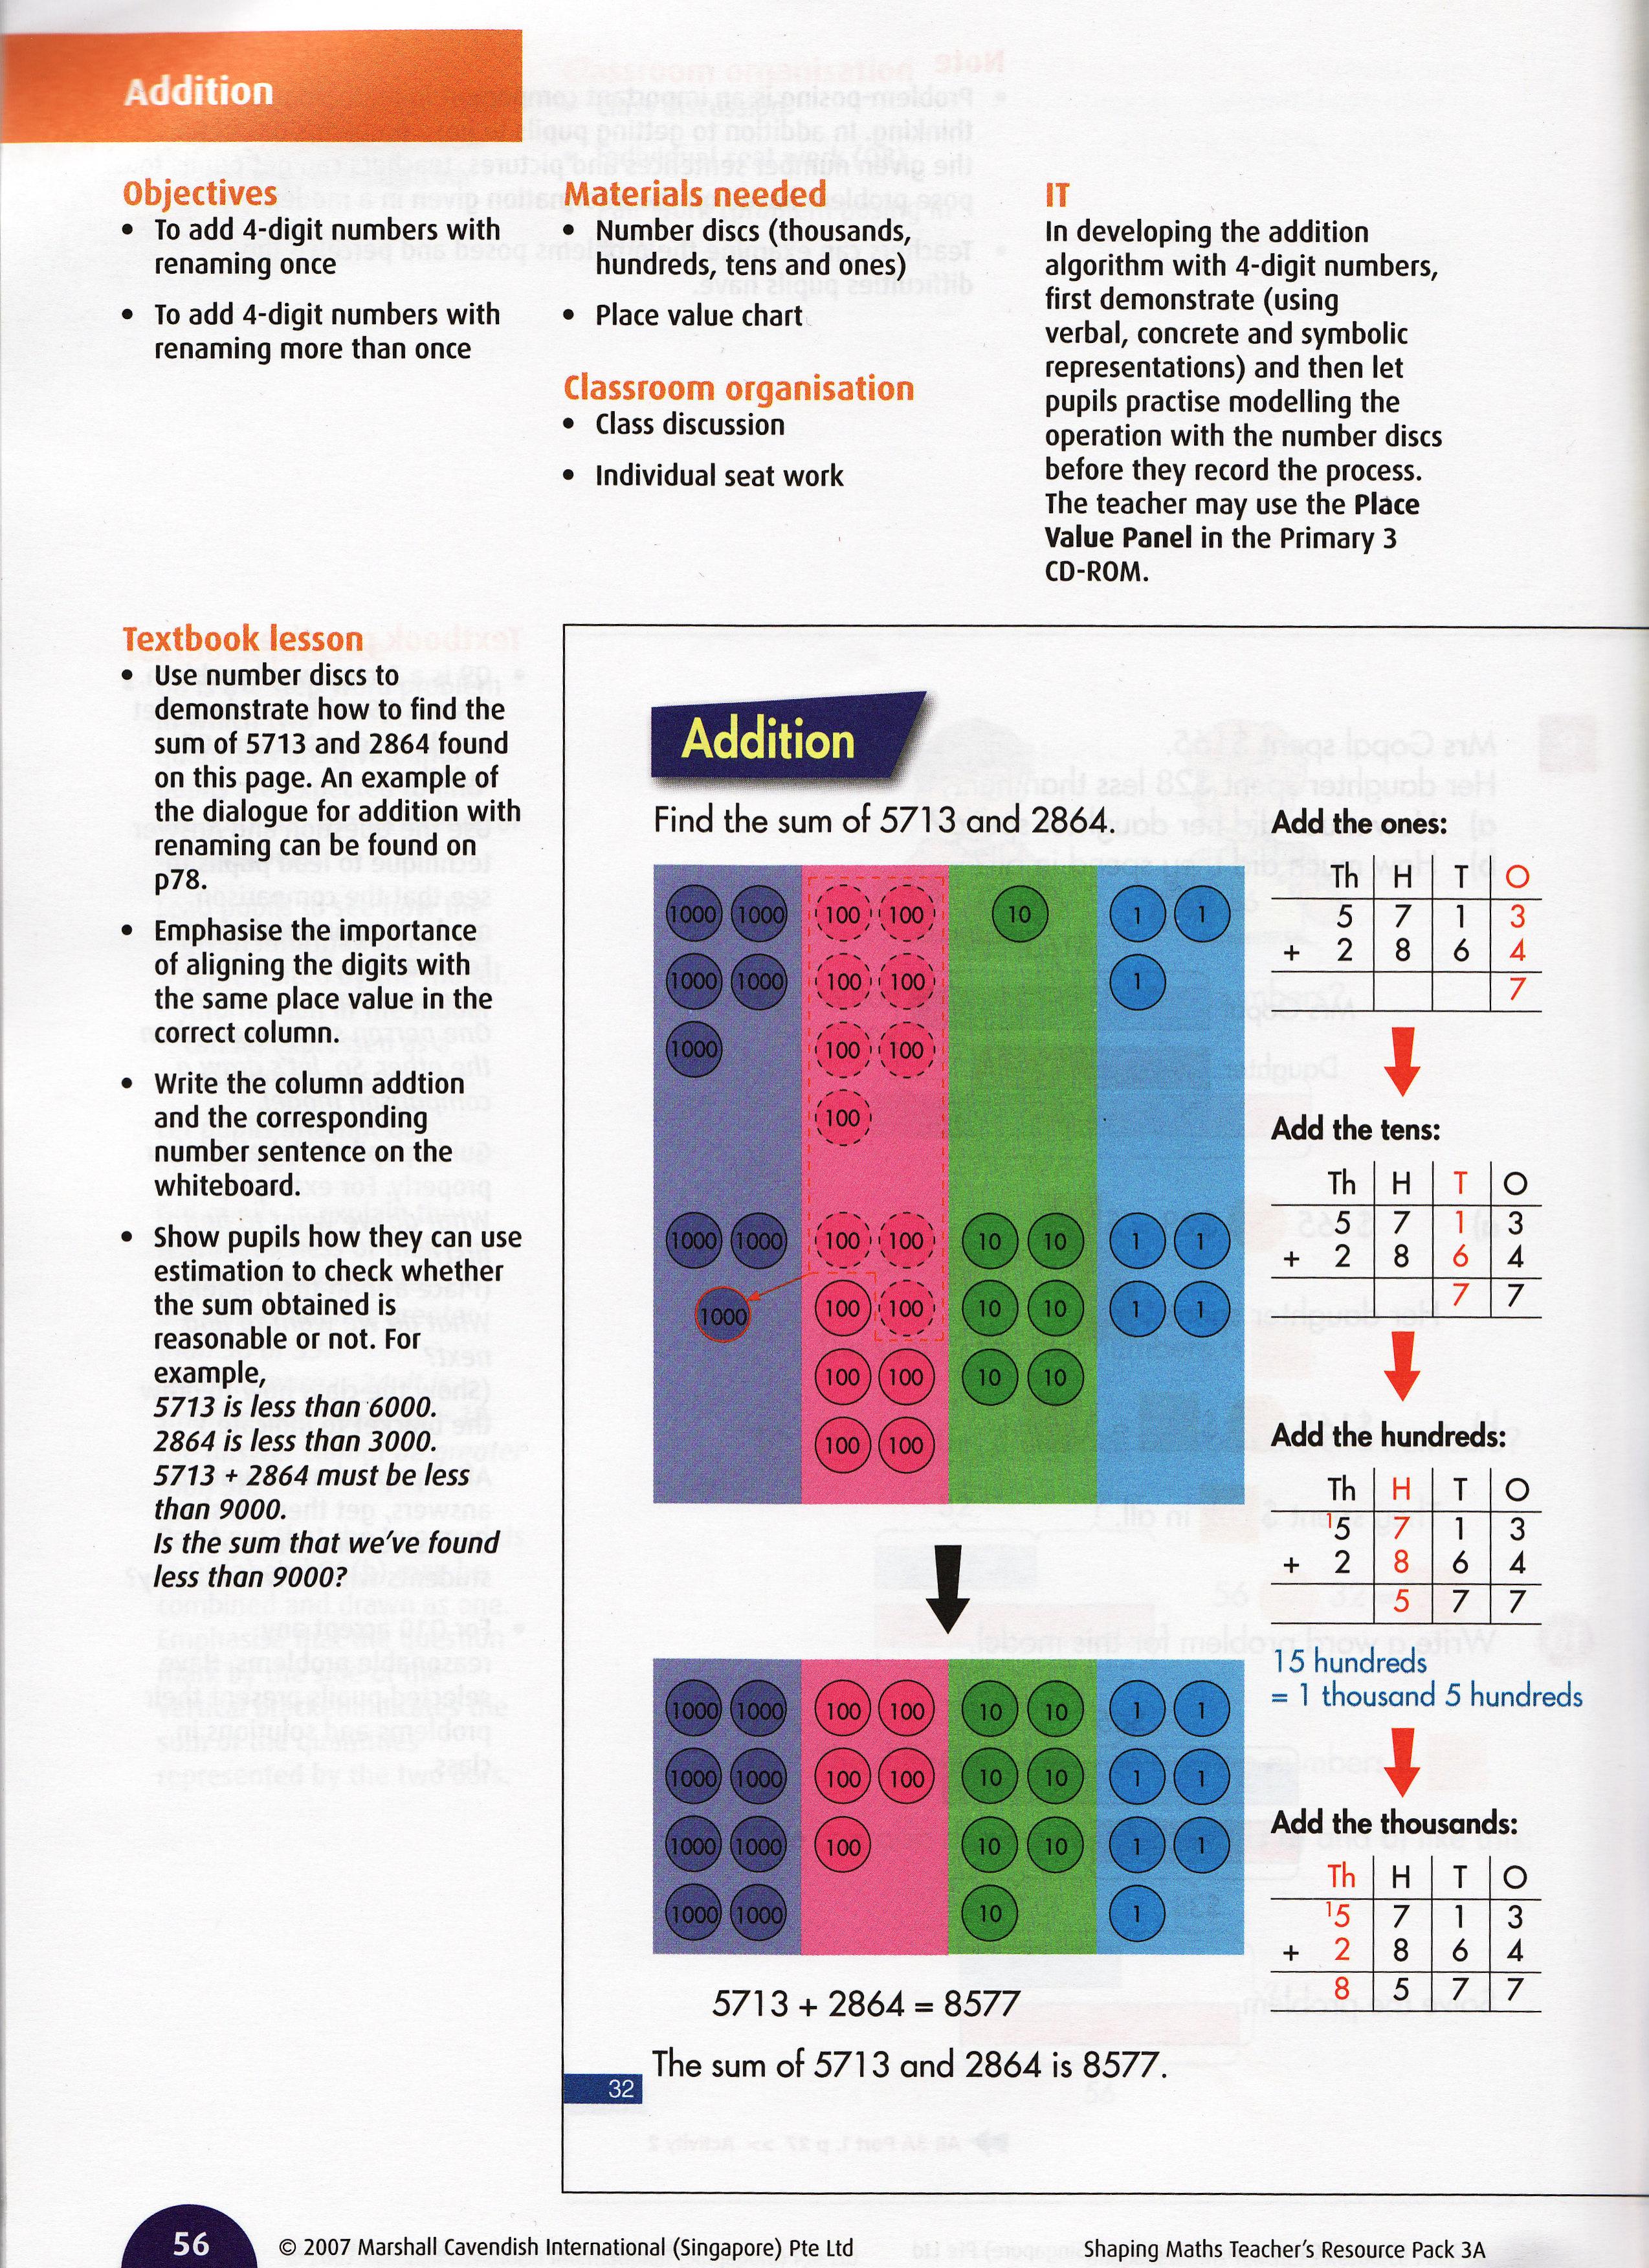 Materials singaporemathsource part 3 add without place value charts shapp56 shaping mathsaddition p 56 nvjuhfo Choice Image